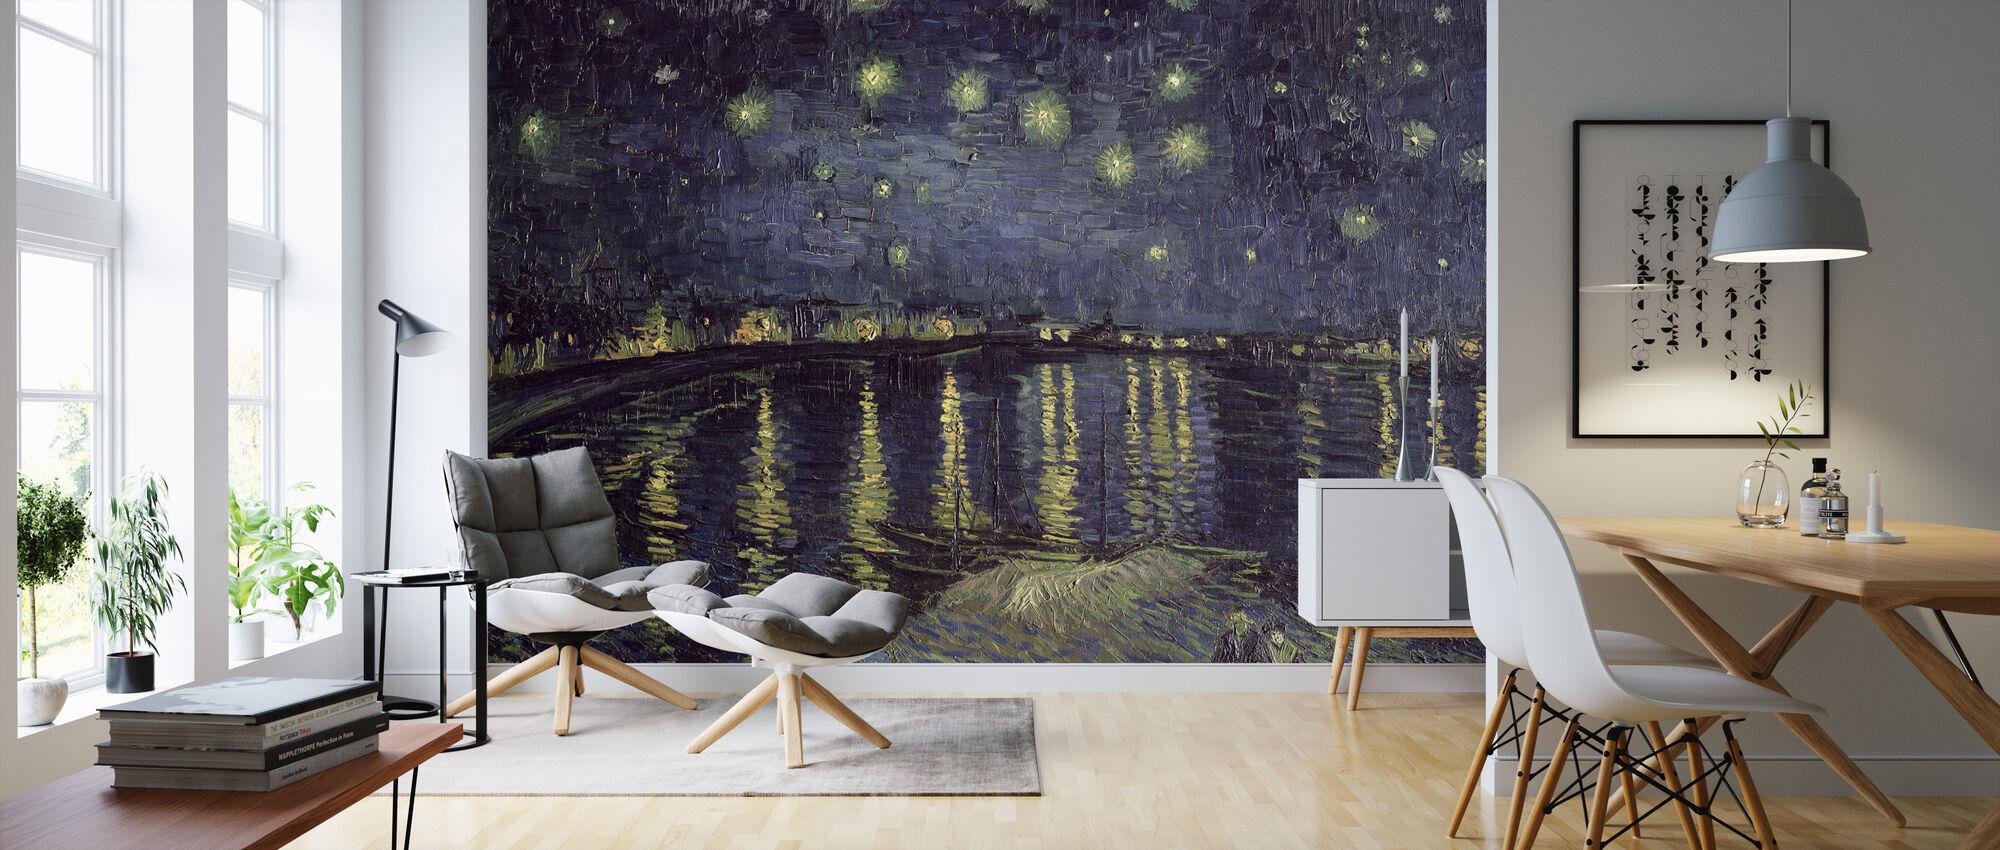 Sterrennacht - Vincent van Gogh - Behang - Woonkamer